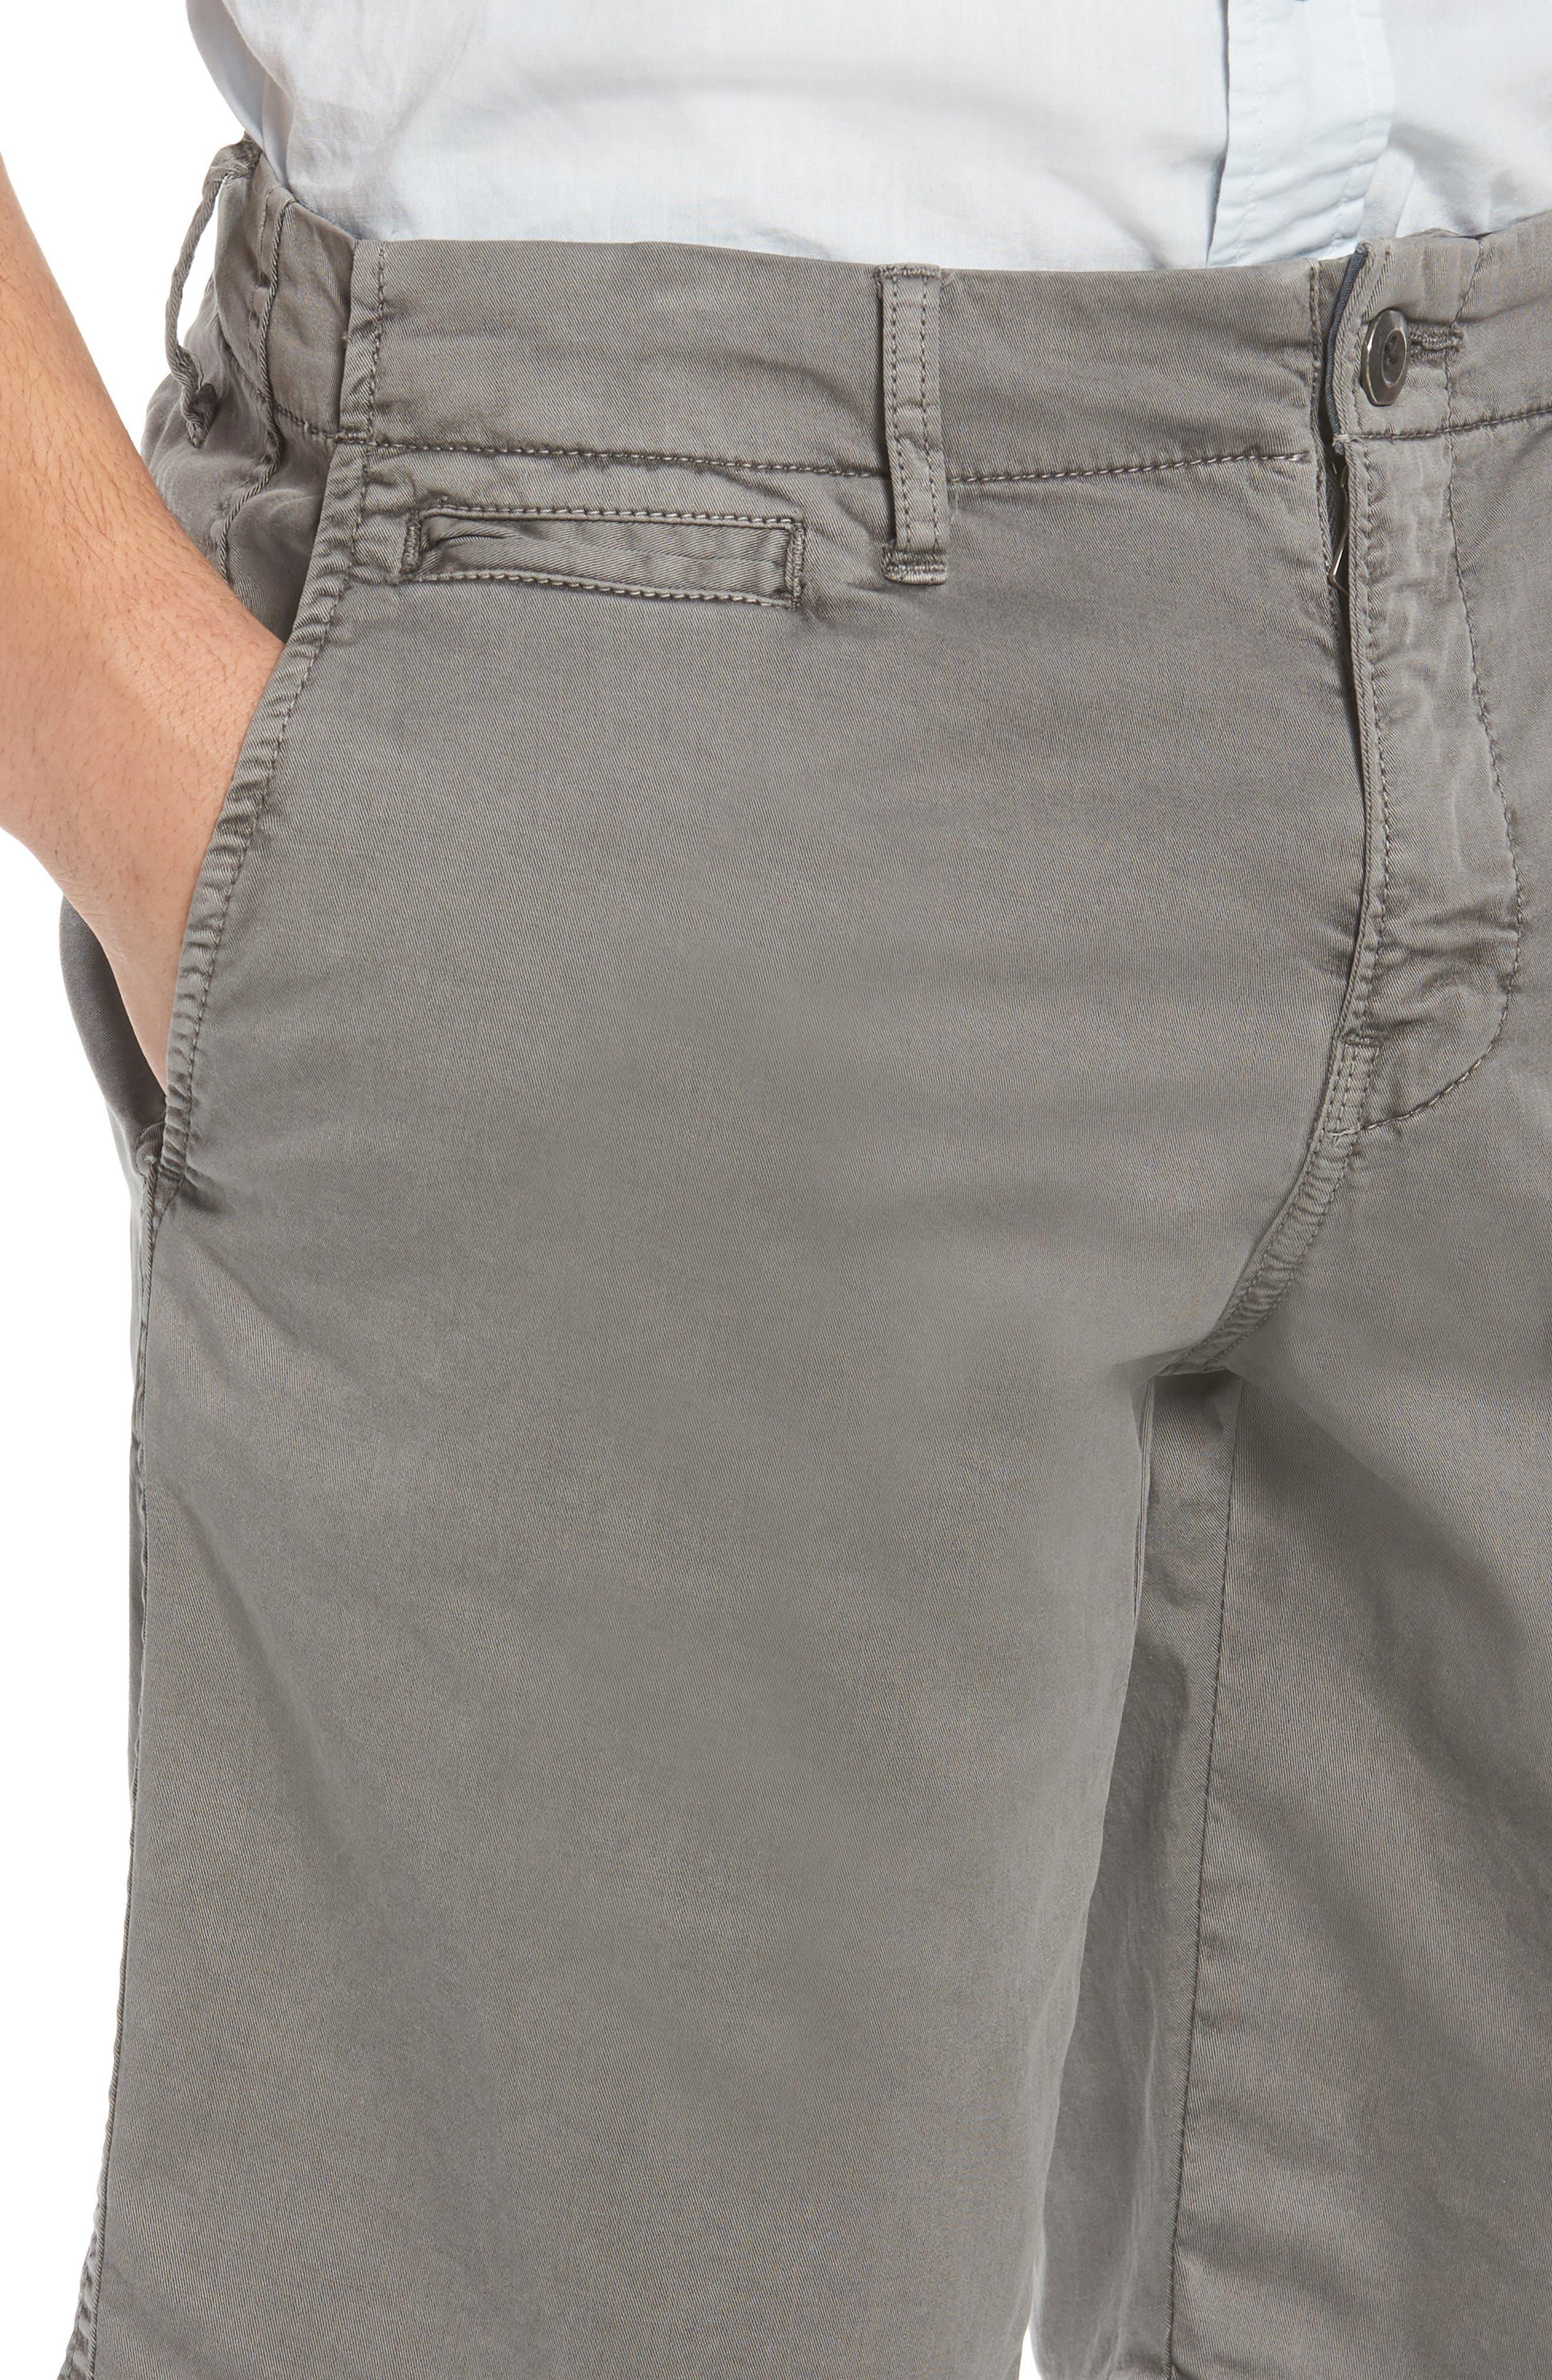 St. Barts Twill Shorts,                             Alternate thumbnail 40, color,